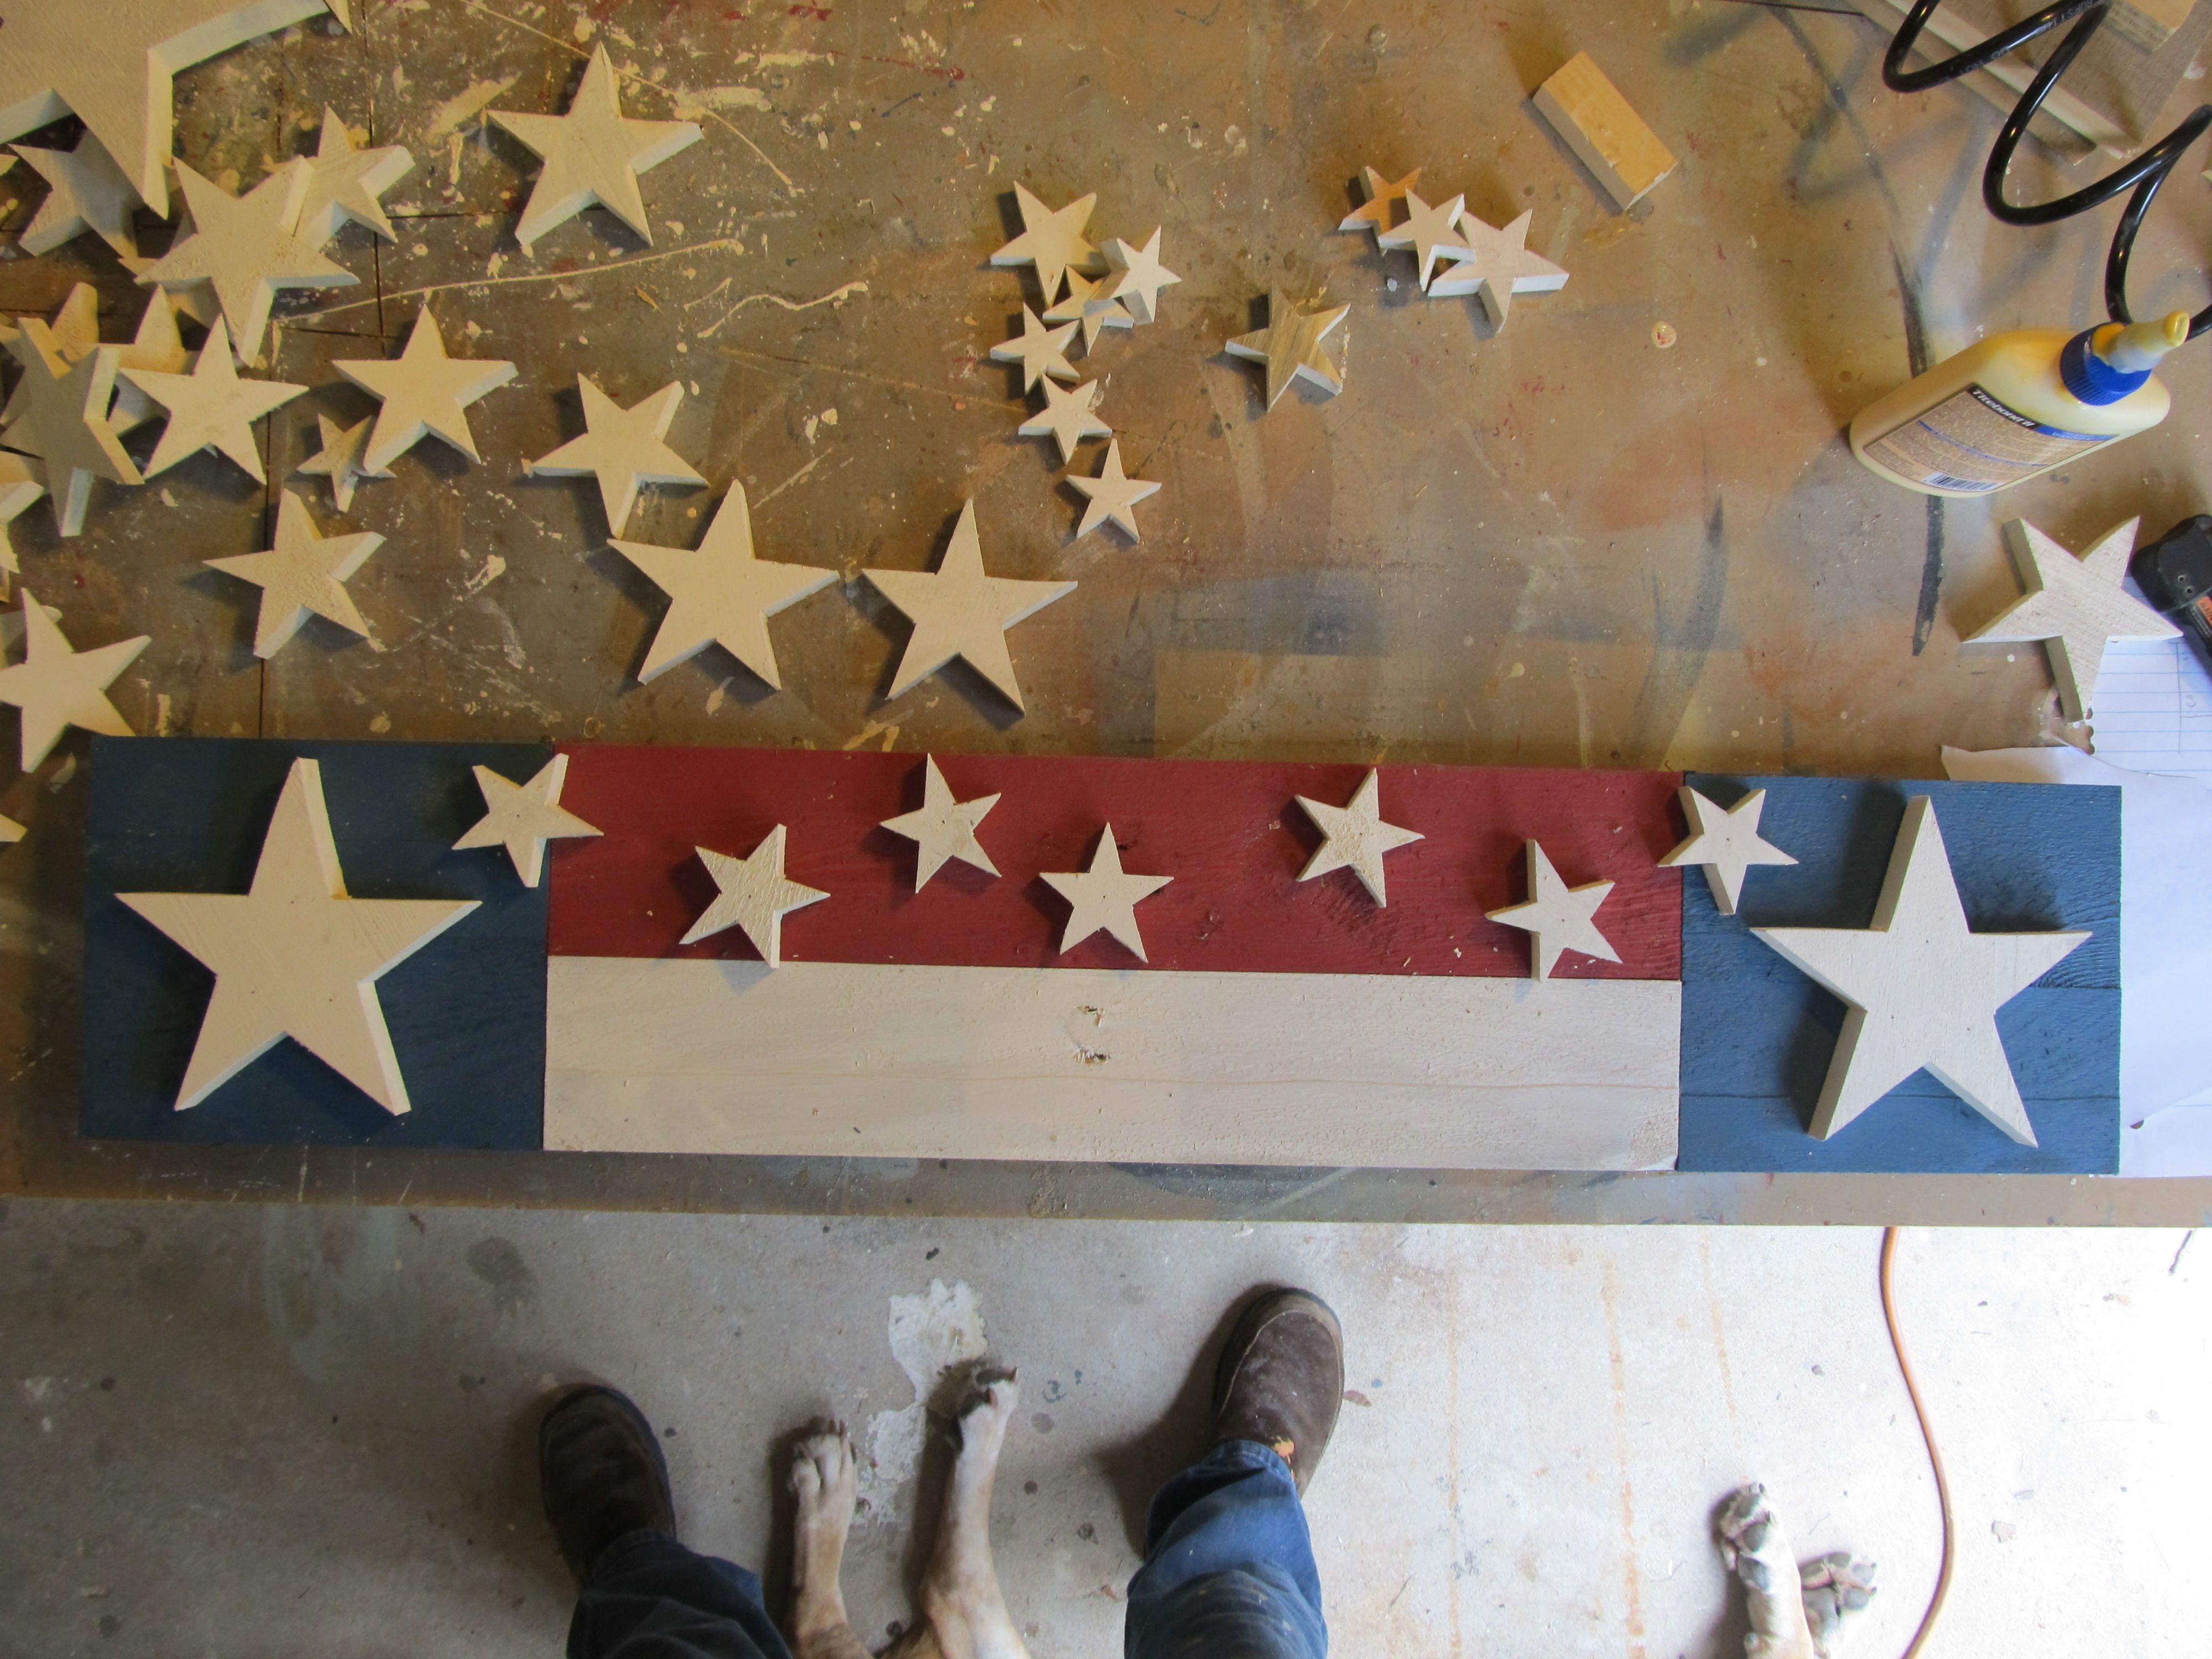 Patriotic Wall Decor Americana And Patriotic Items Made